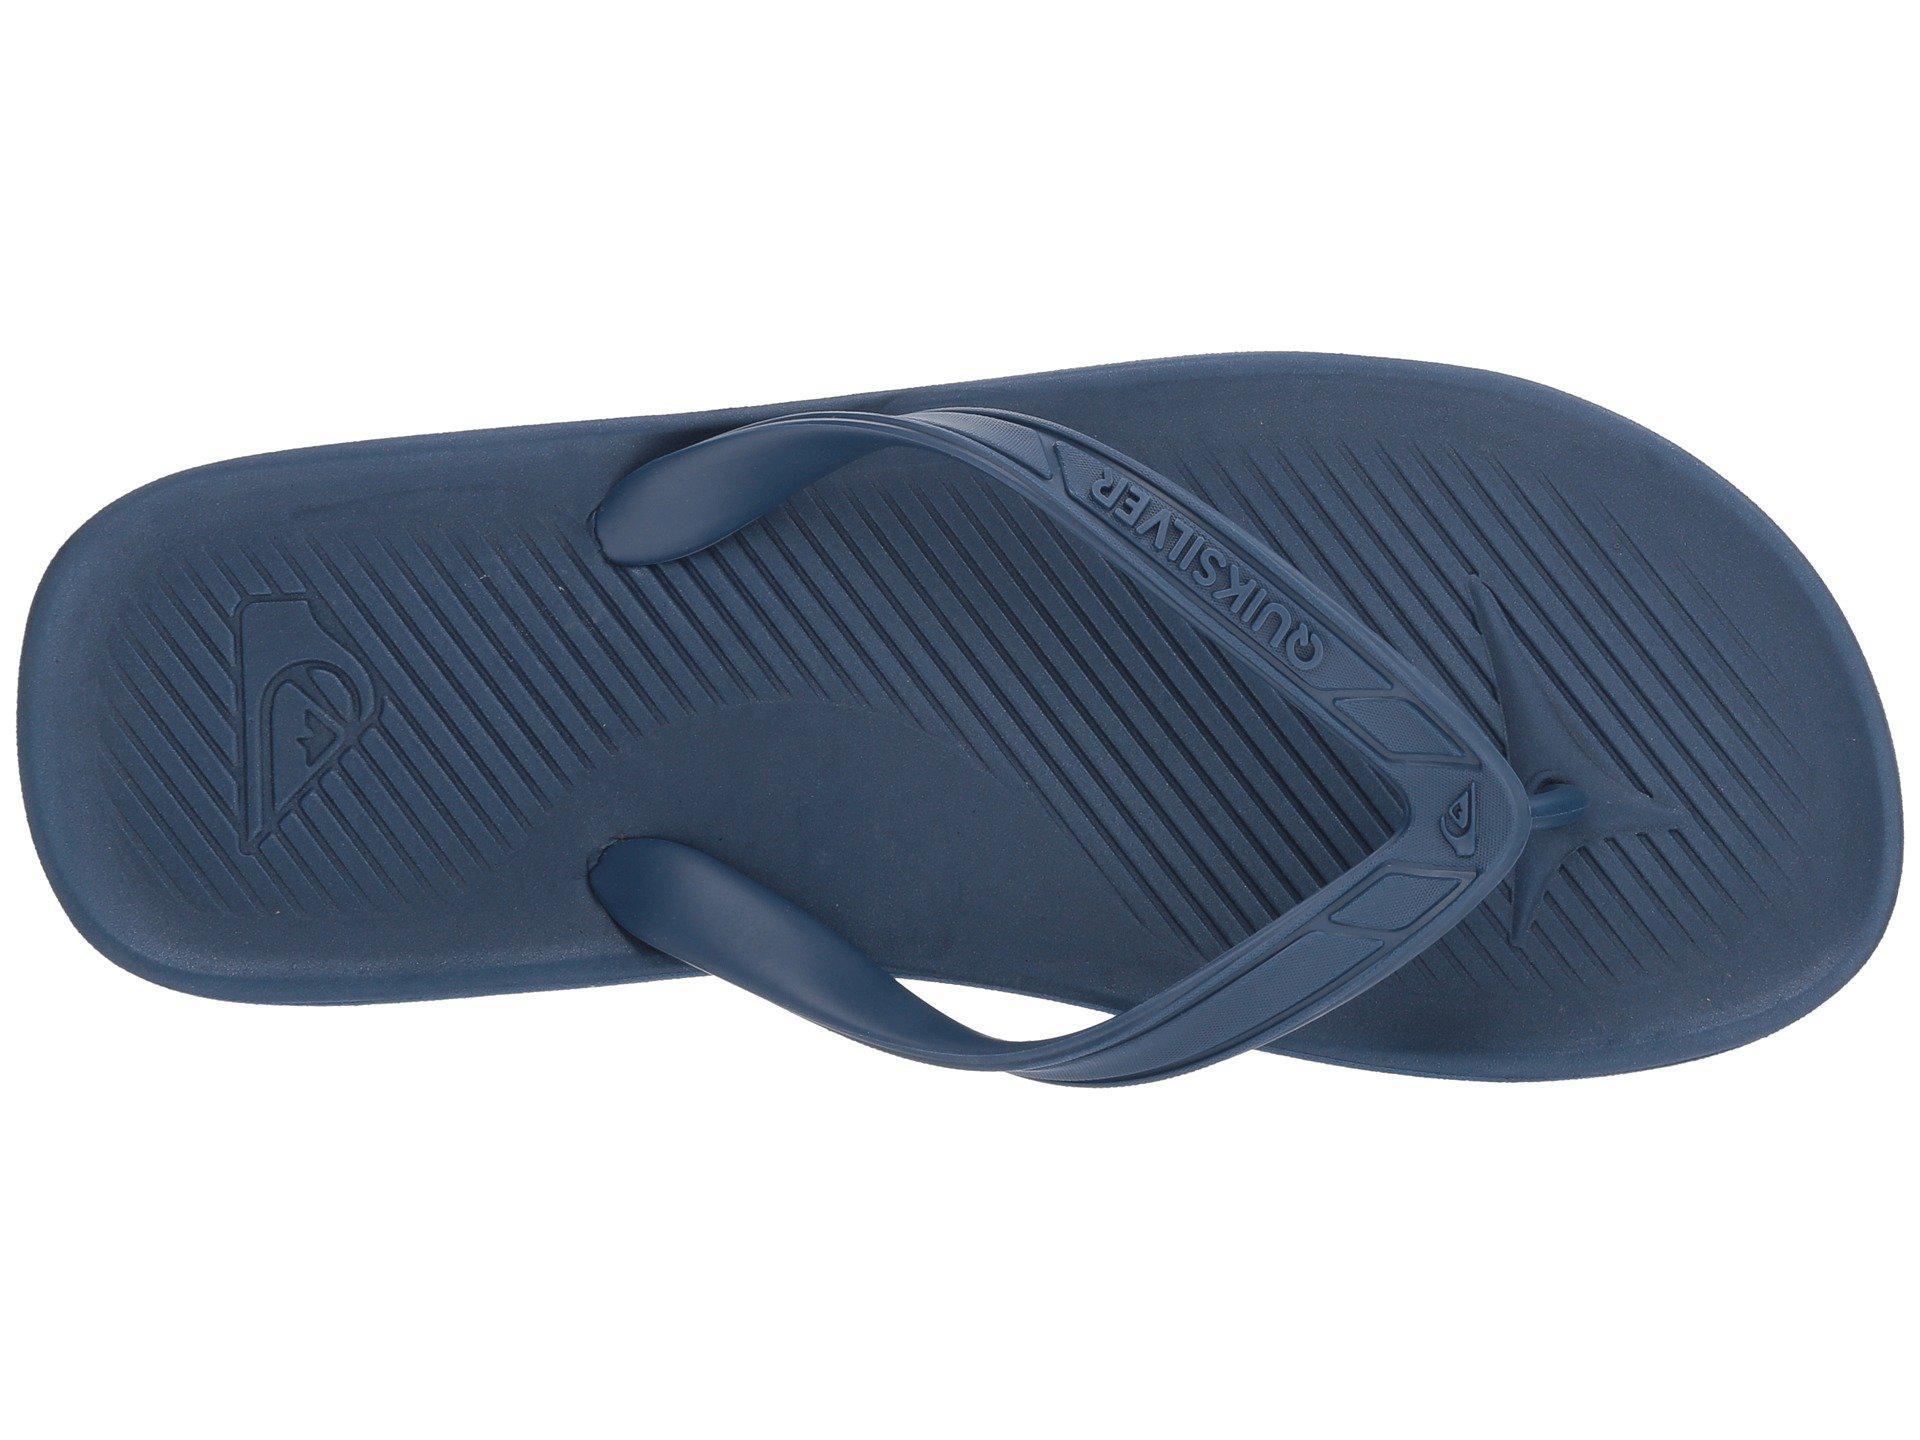 Quiksilver - Blue Haleiwa Ii (black red green) Men s Sandals for Men. View  fullscreen a36f3d58b0